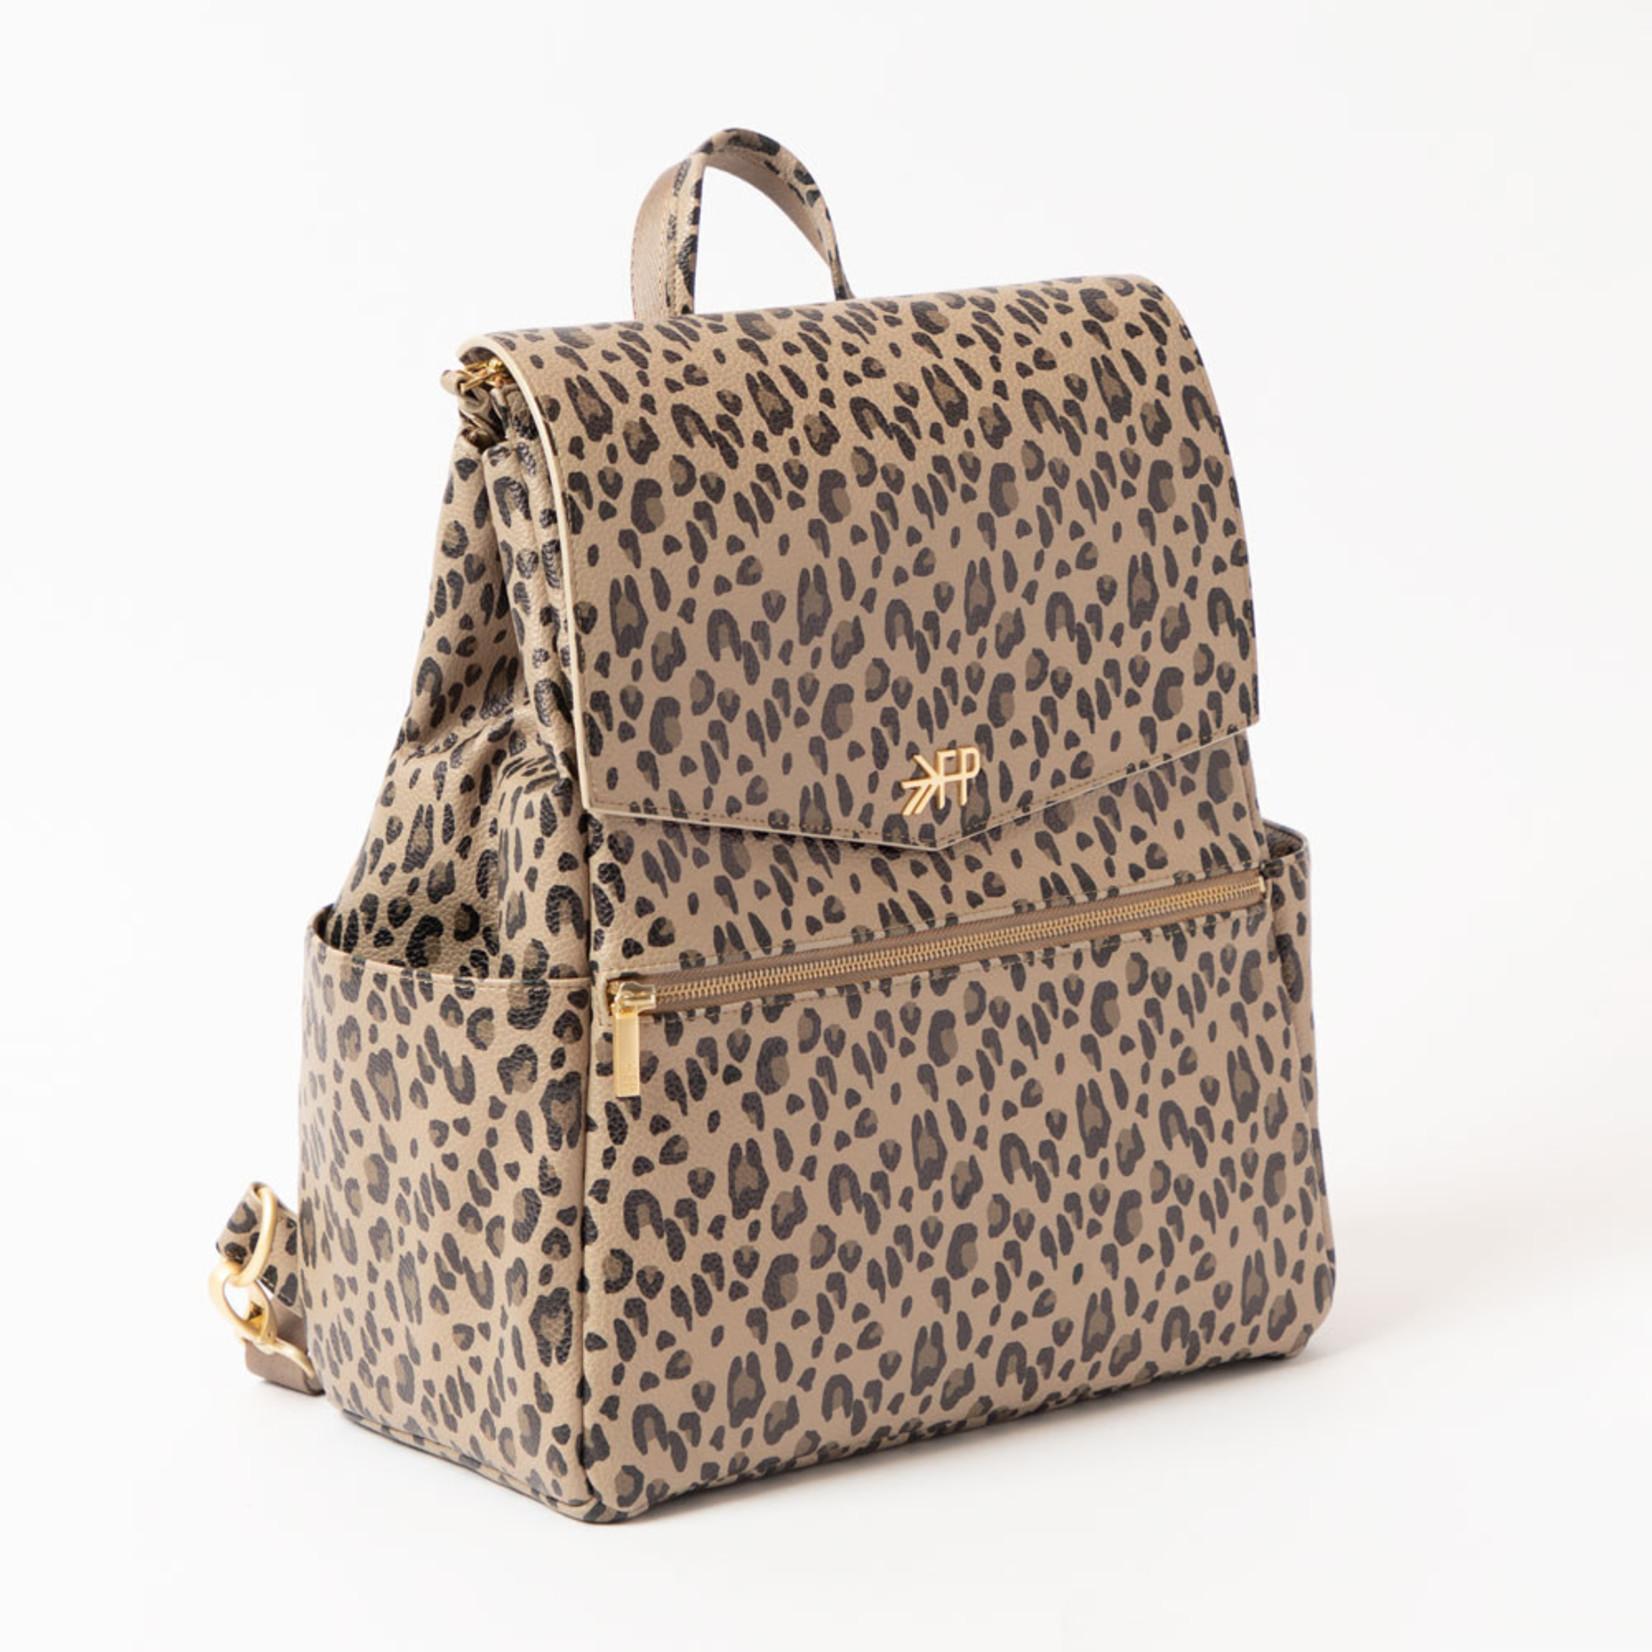 Freshly Picked Classic Diaper Bag Leopard